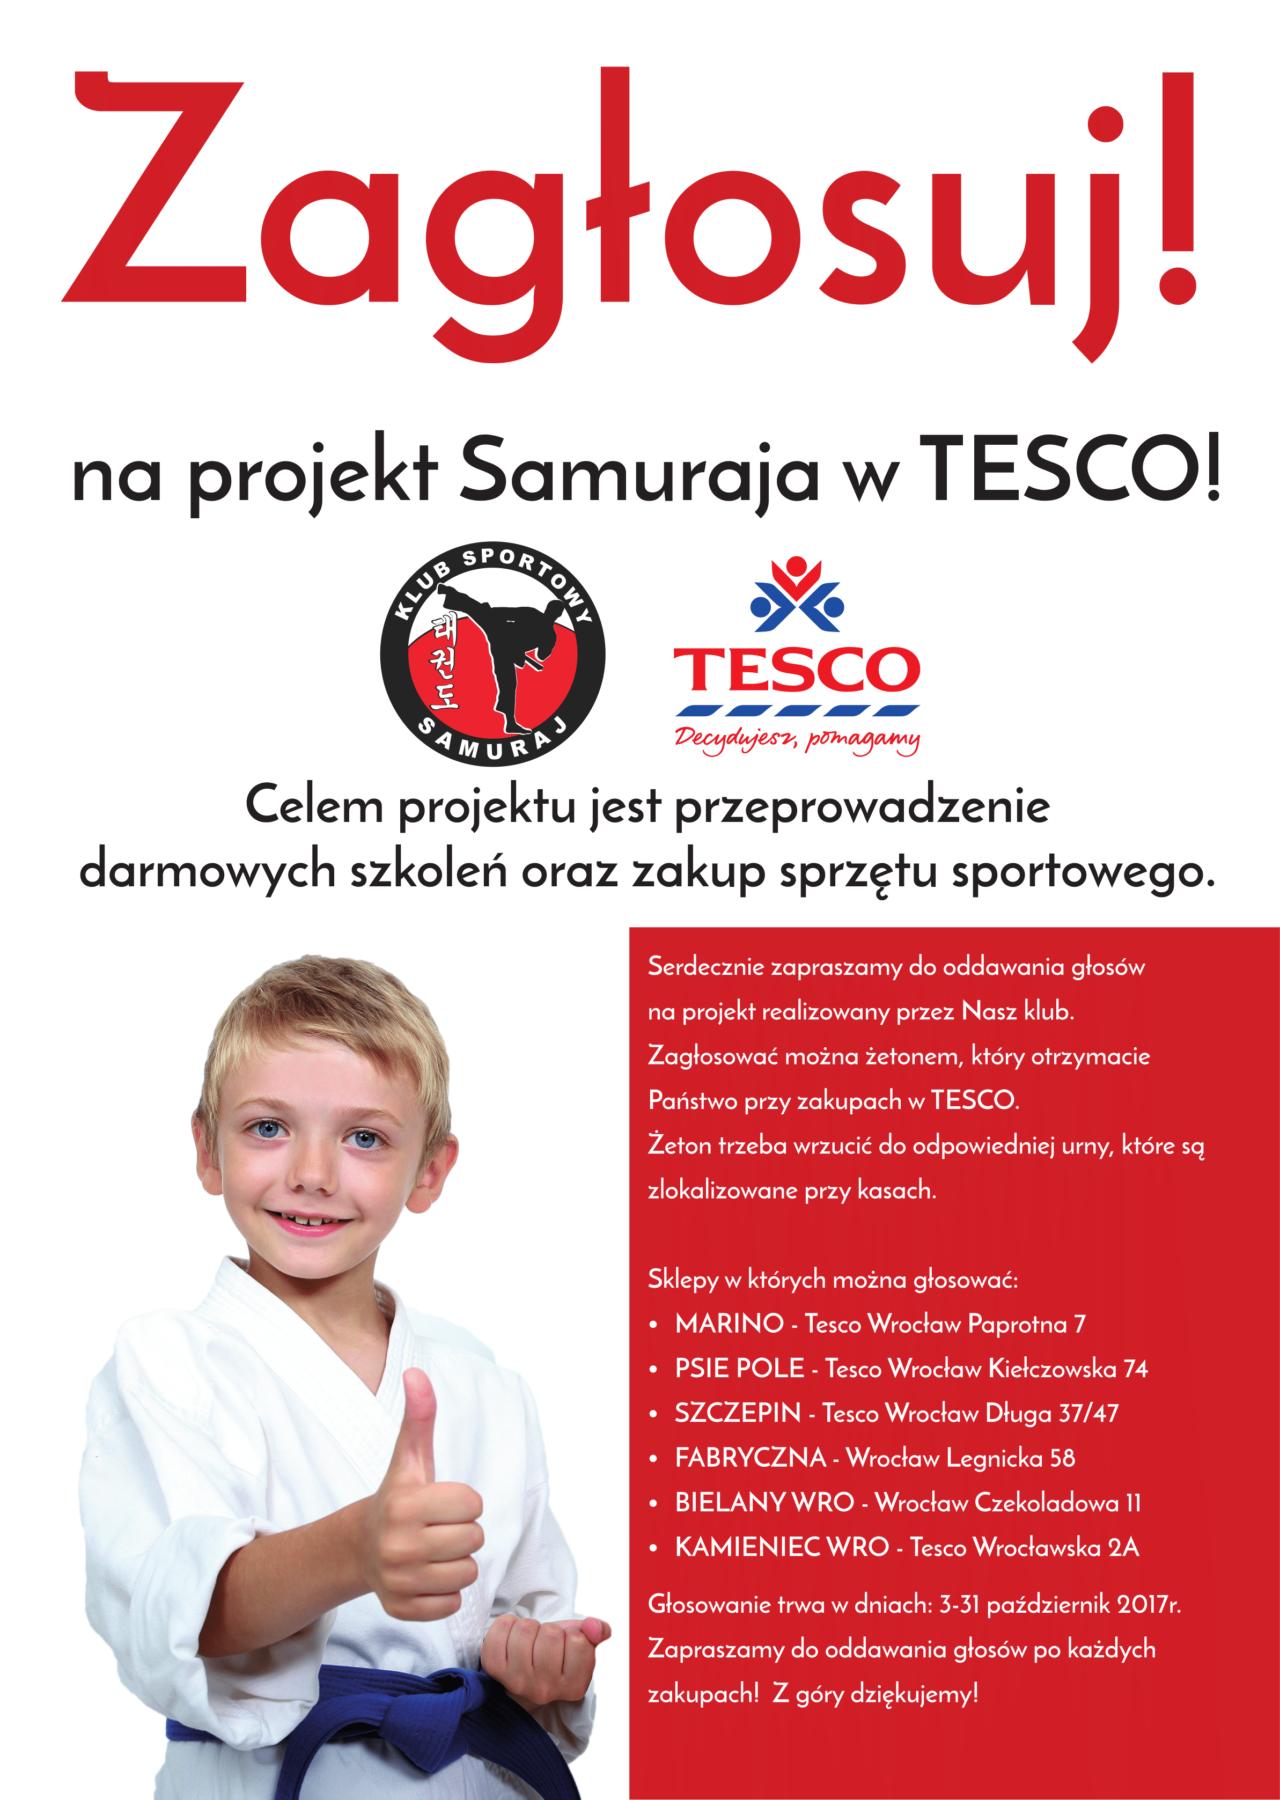 tesco_habiak1-1-1-1280x1800.png